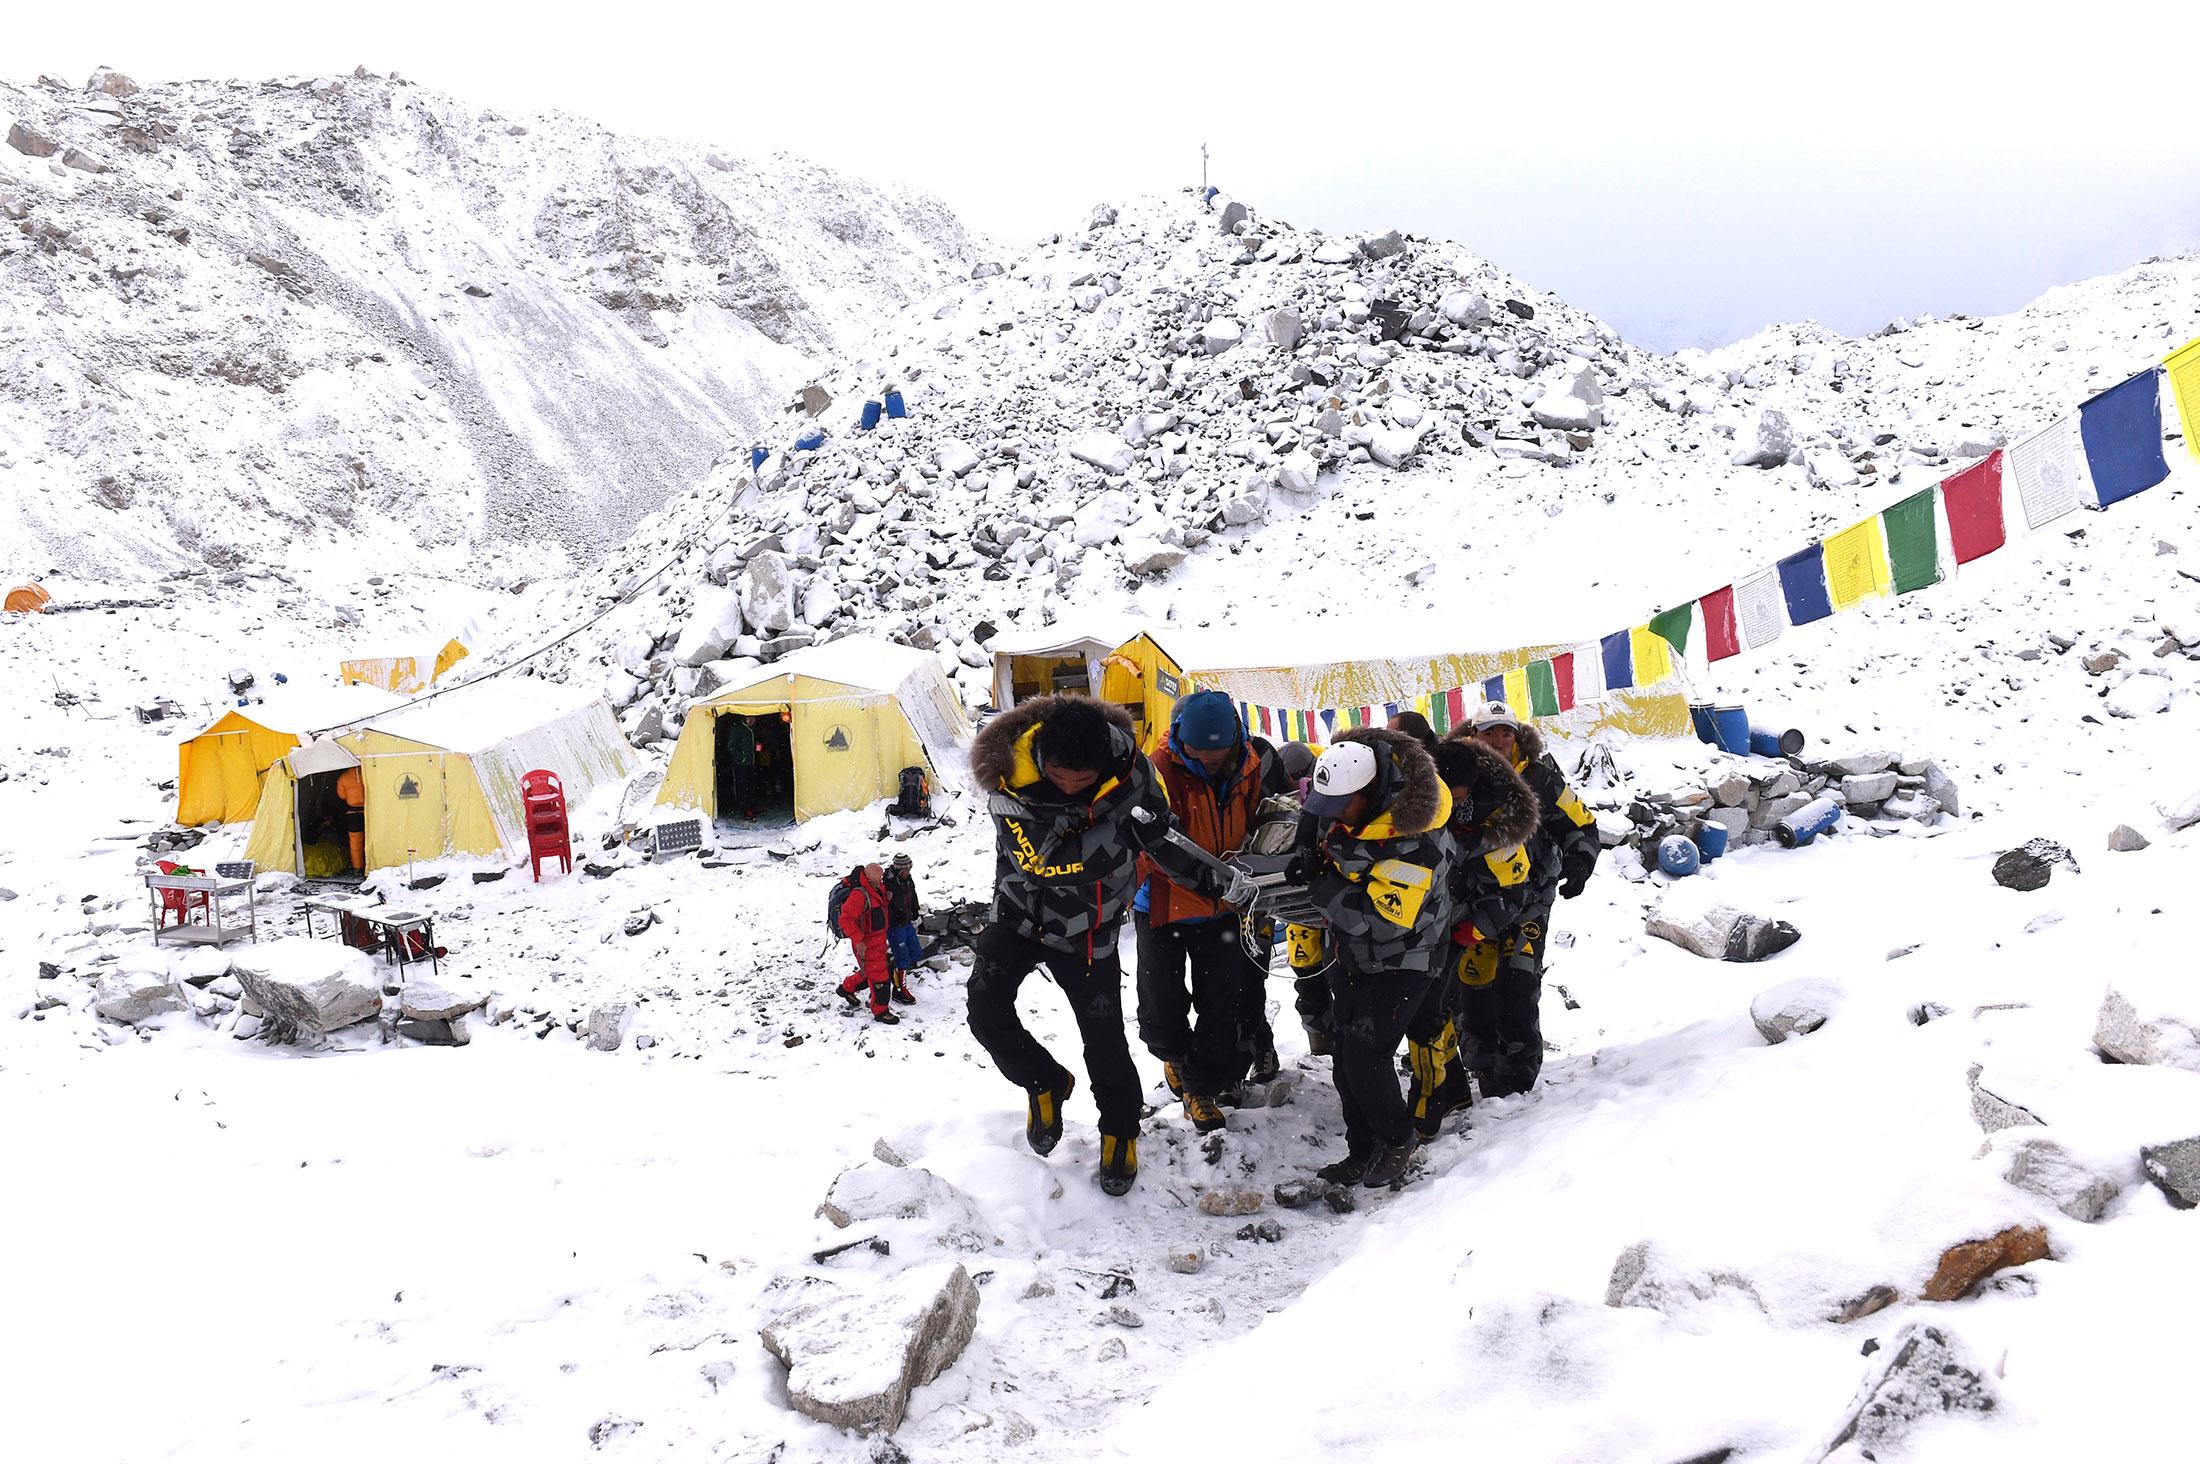 On Everest